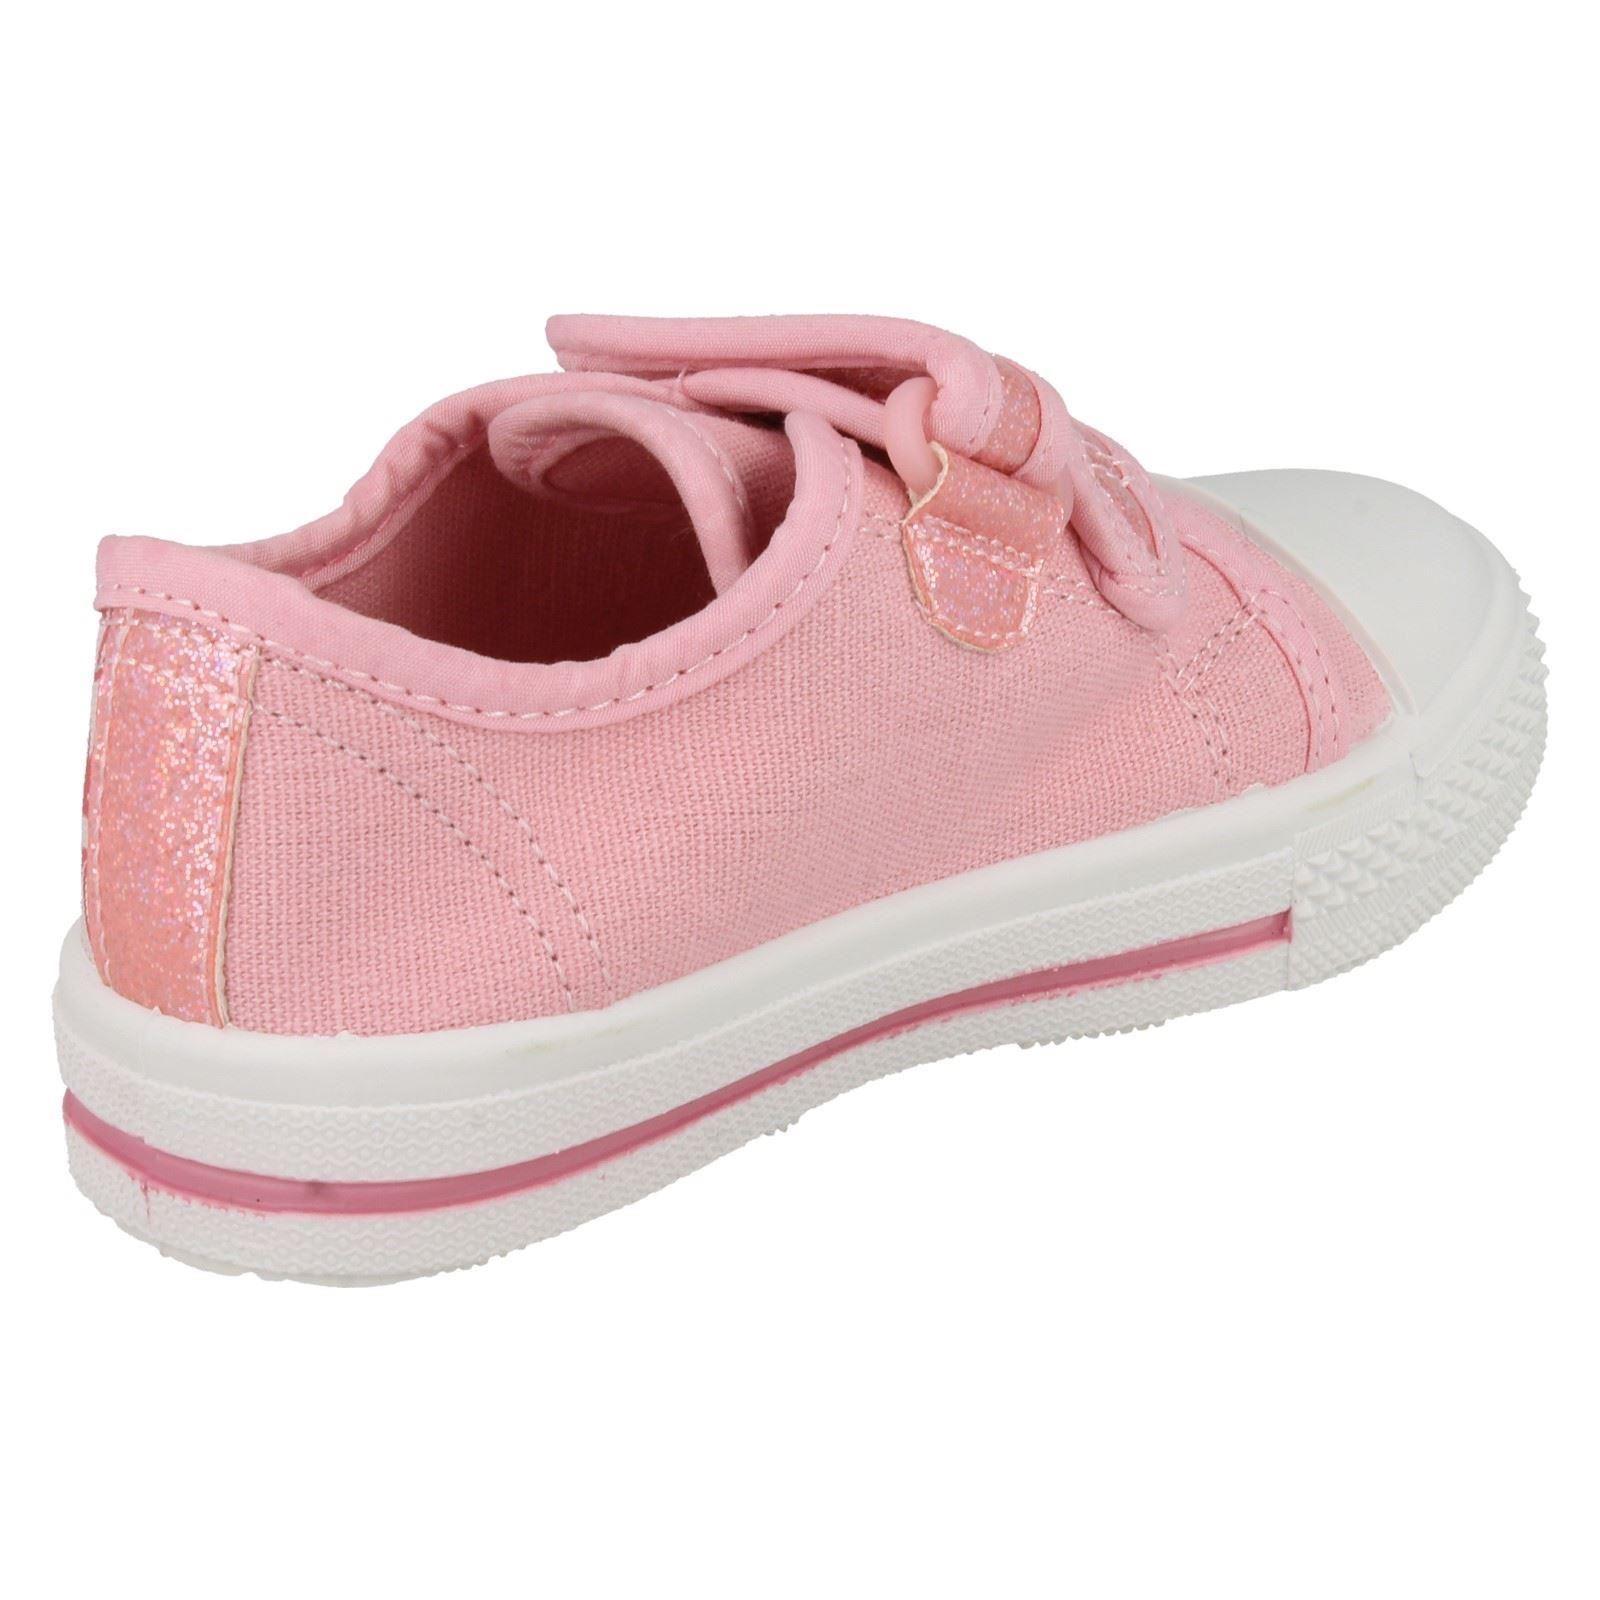 Girls Character Disney Canvas Shoes - 'Princess Castile'